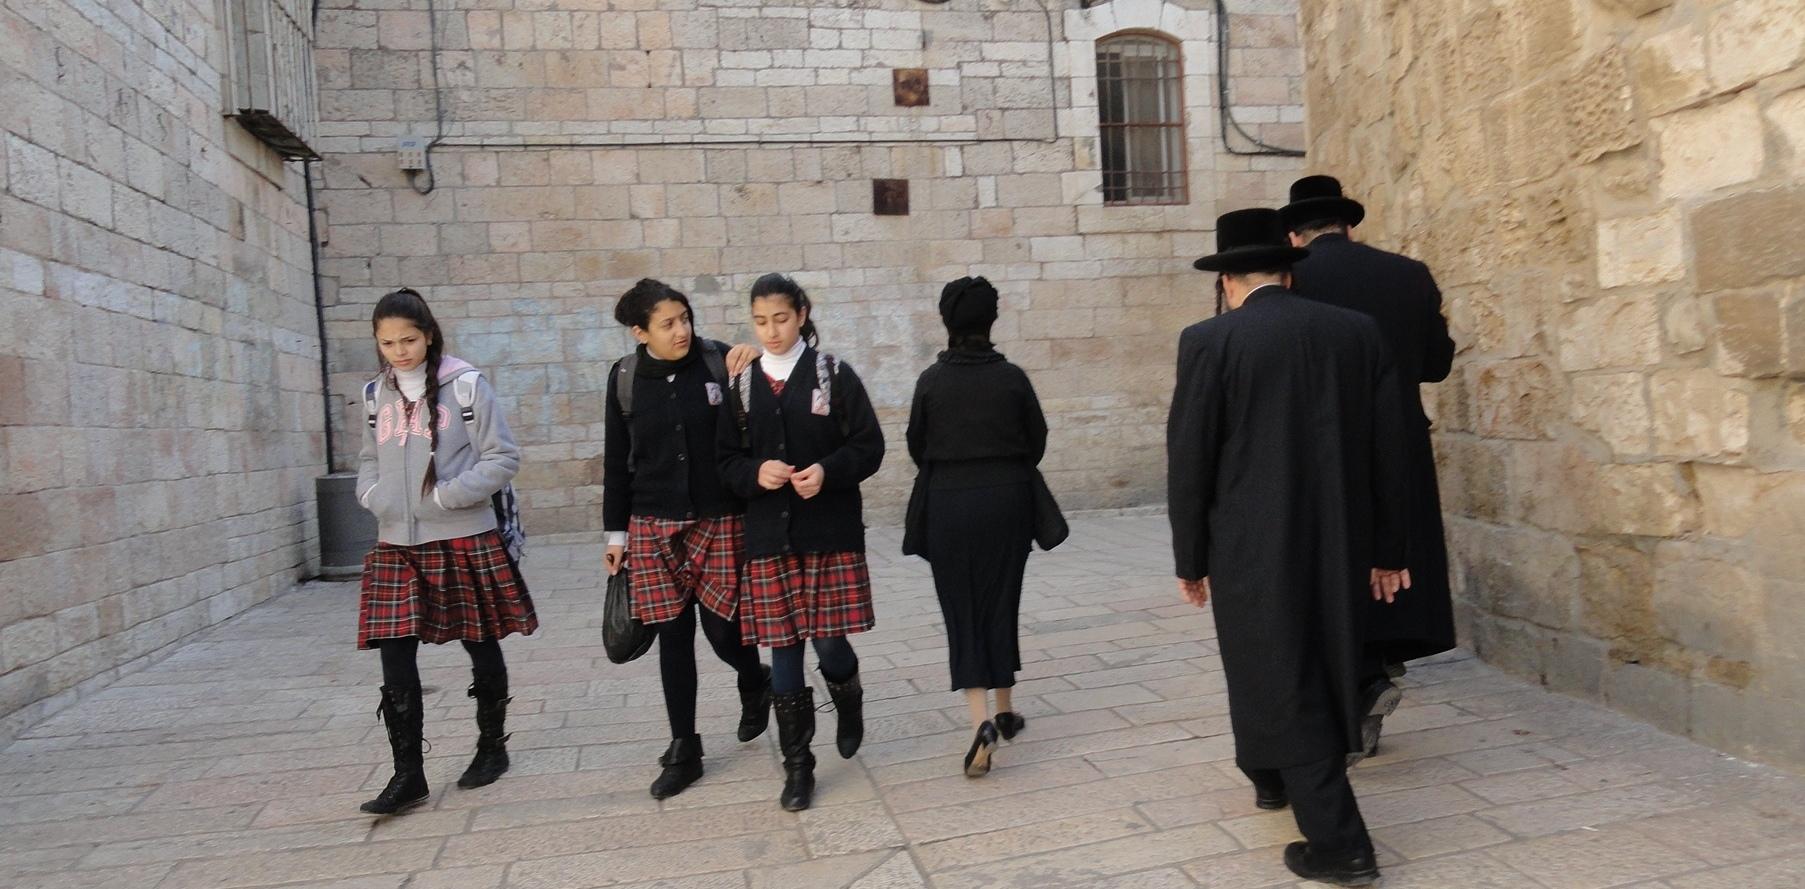 Israel school girl nude remarkable, rather